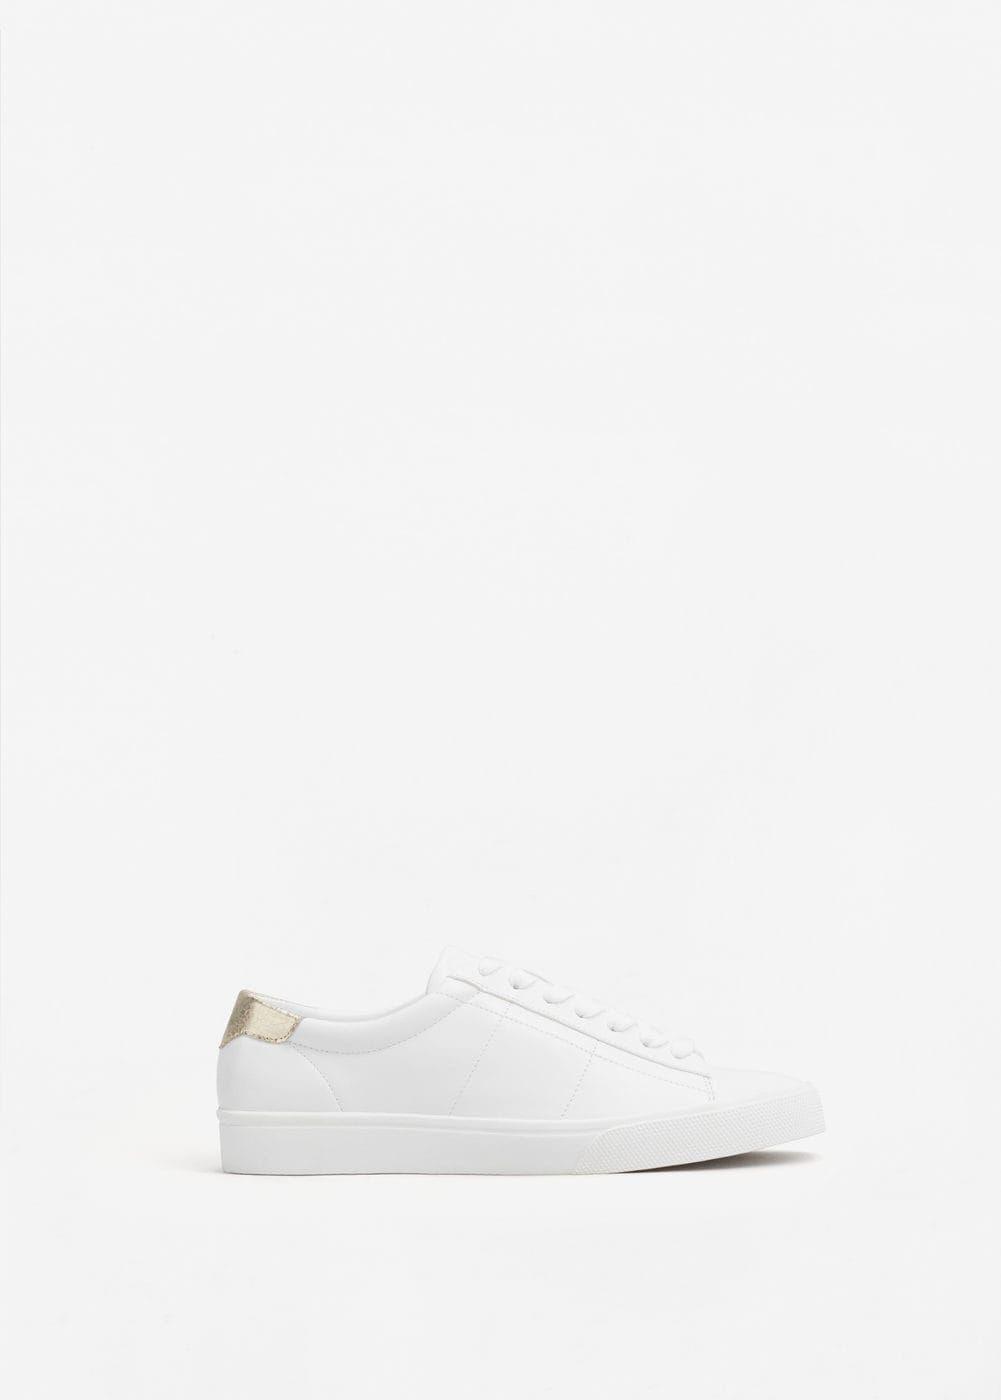 Contrast appliqué sneakers. Contrast appliqué sneakers Tennis ead27c514